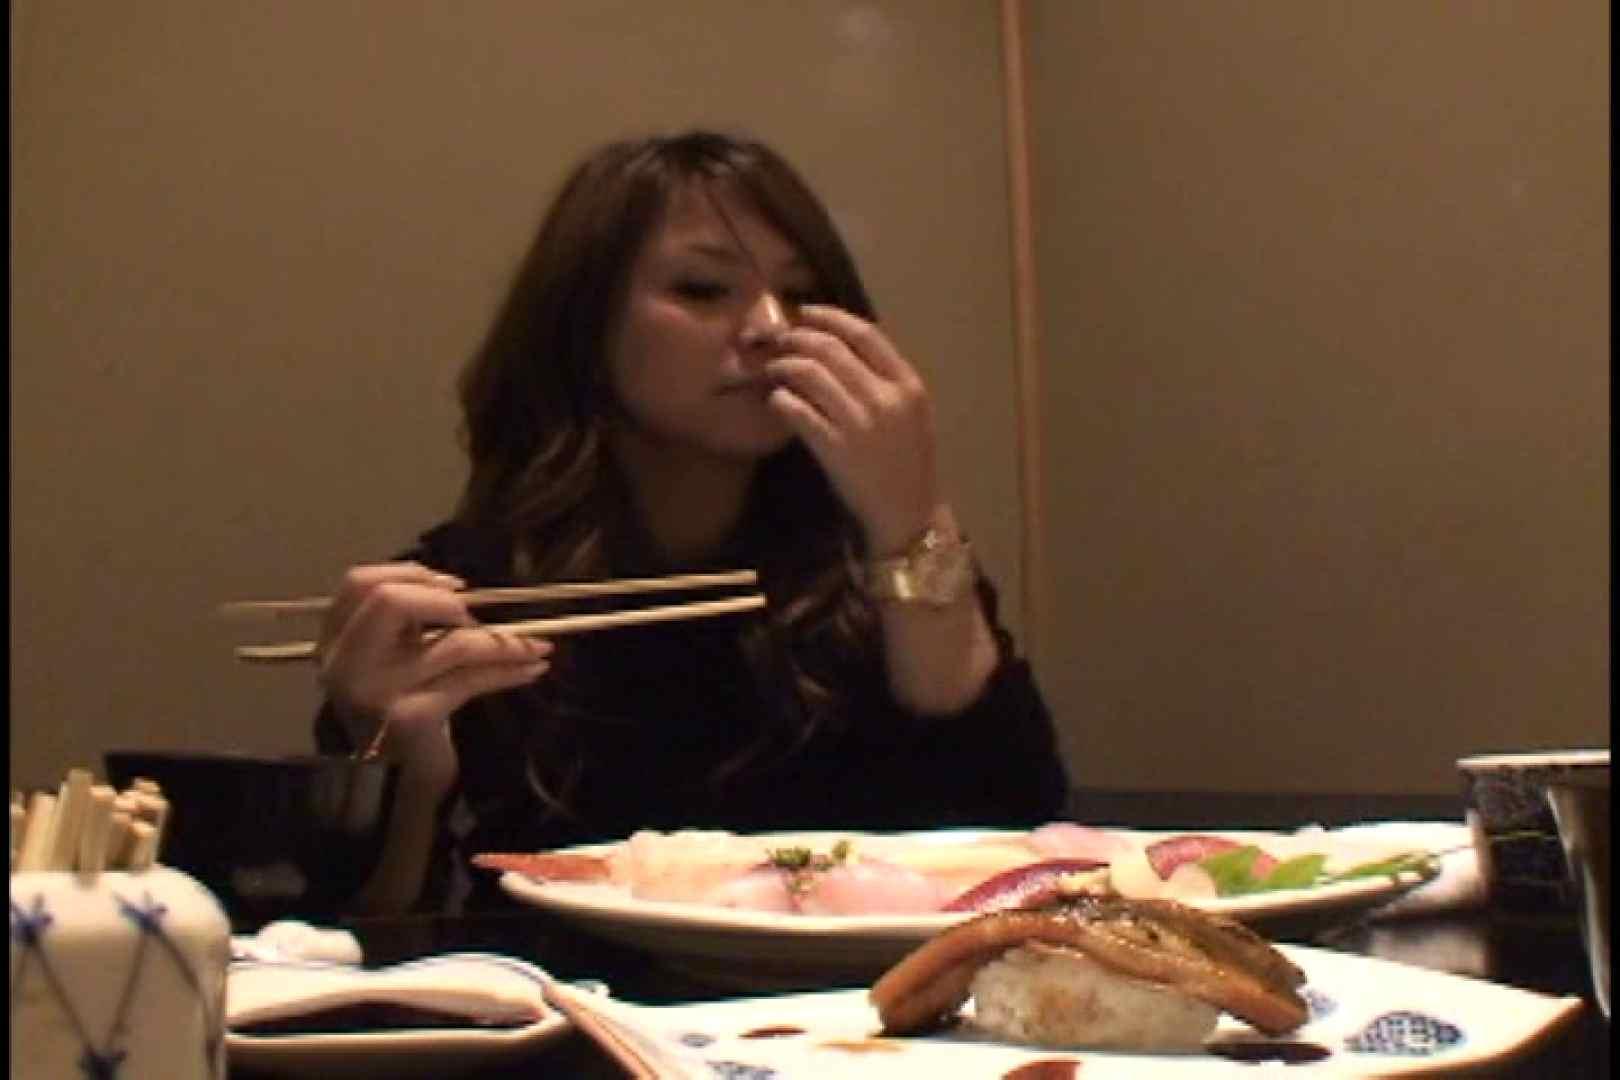 JDハンター全国ツアー vol.009 後編 女子大生のエロ動画 | 0  112PIX 37